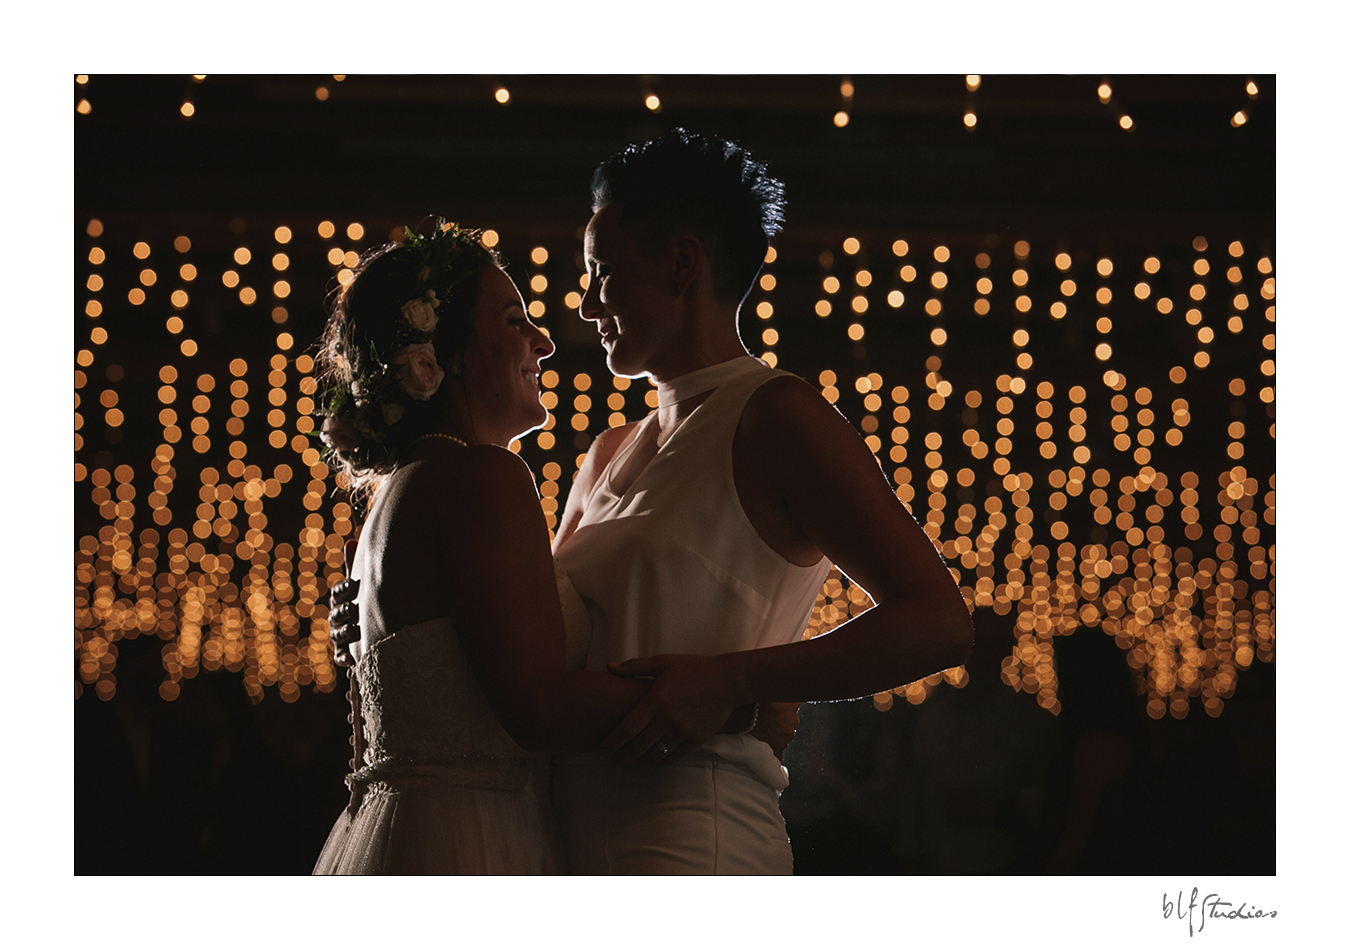 047-winnipeg-hitchnpost-wedding-marla-alana.jpg